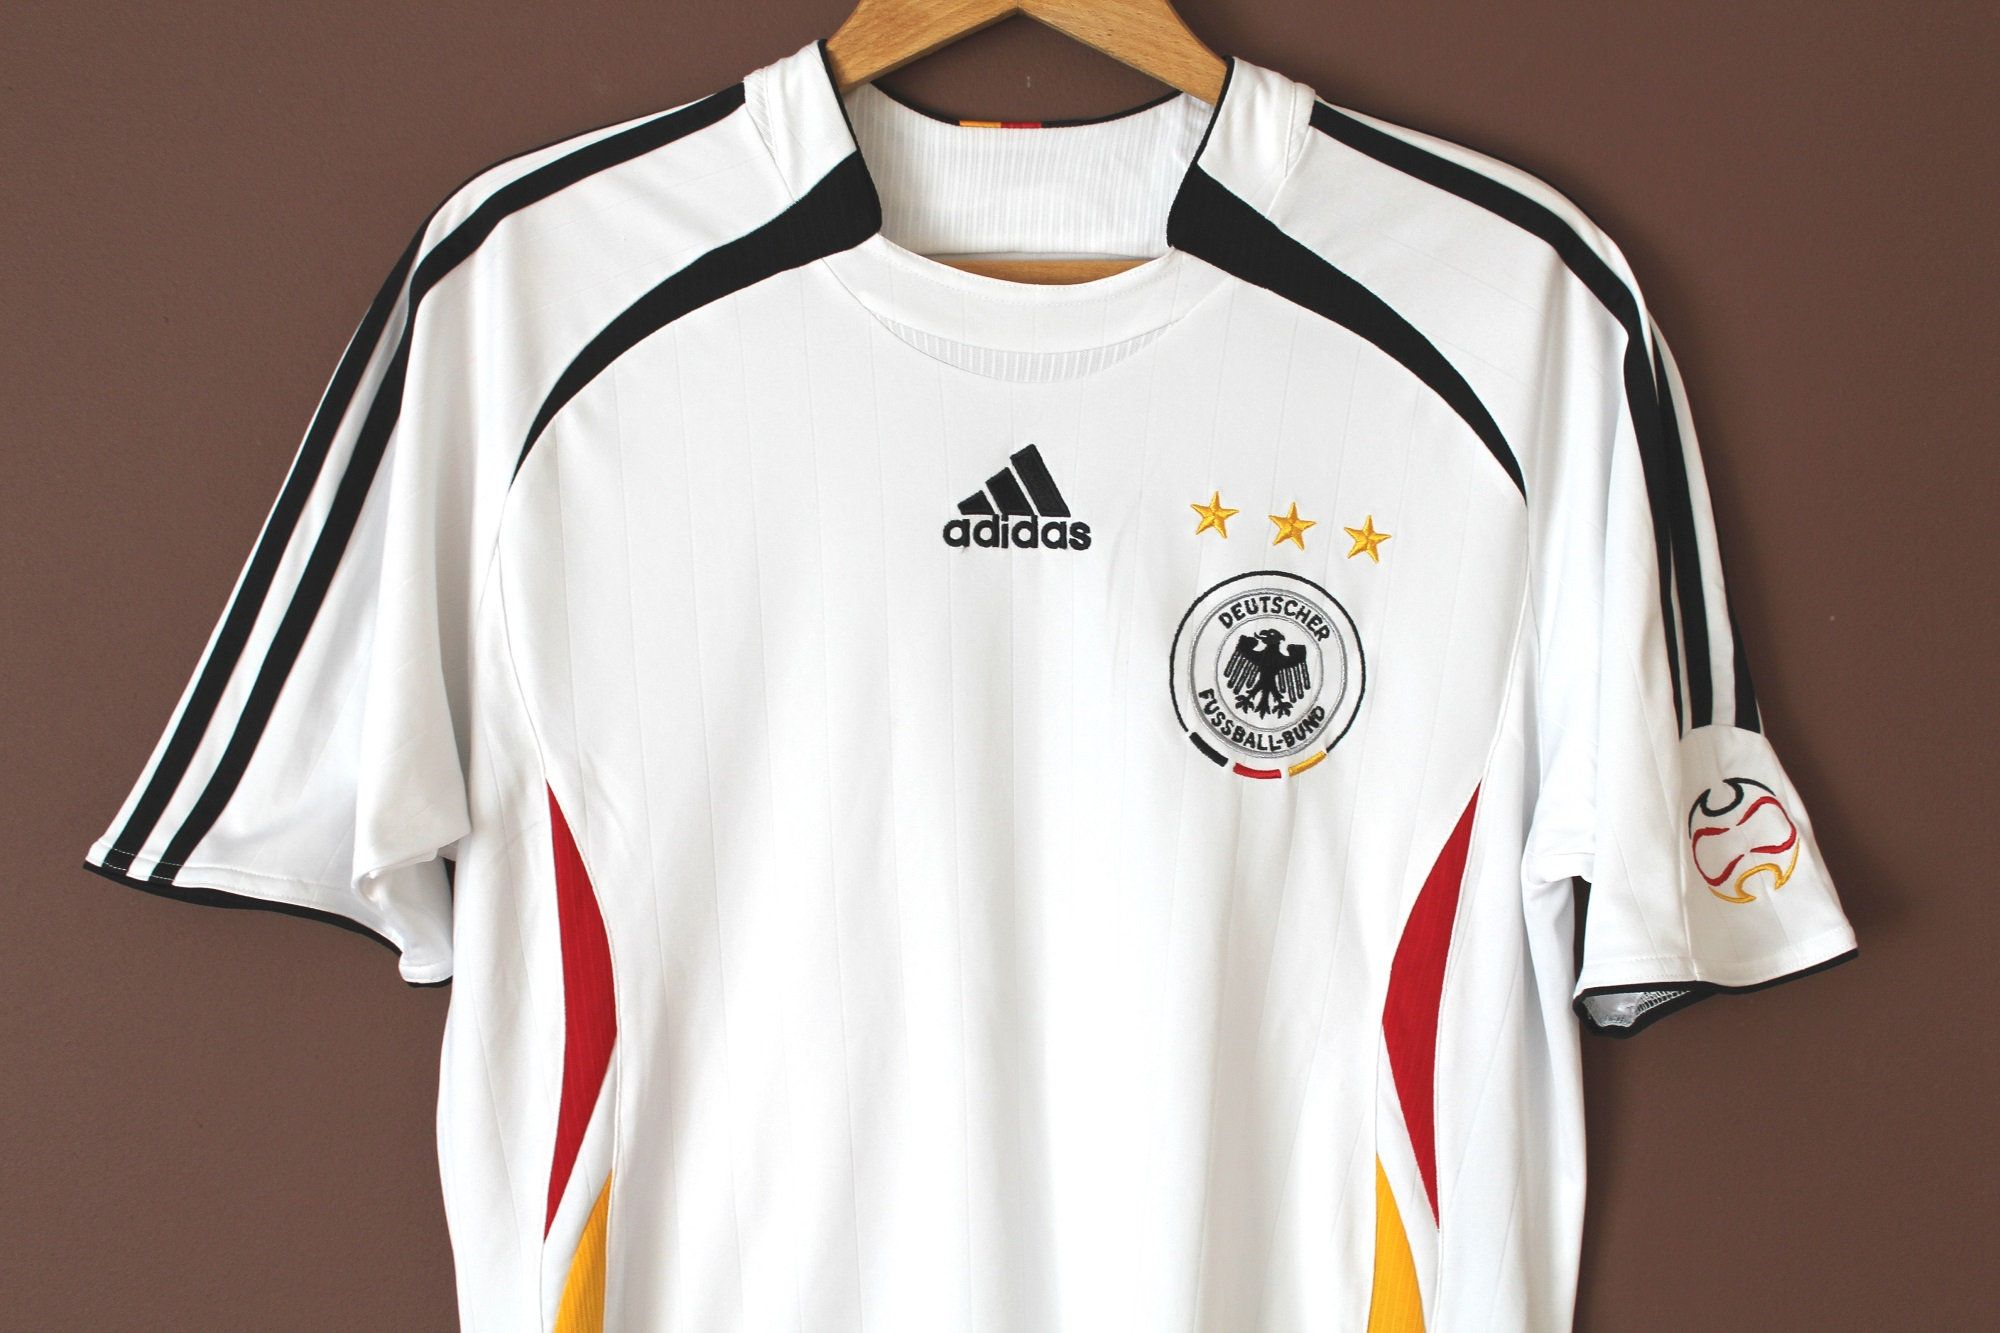 Vintage Adidas German Football Shirt White Deutscher Etsy Vintage Adidas Shirts Football Shirts [ 1333 x 2000 Pixel ]